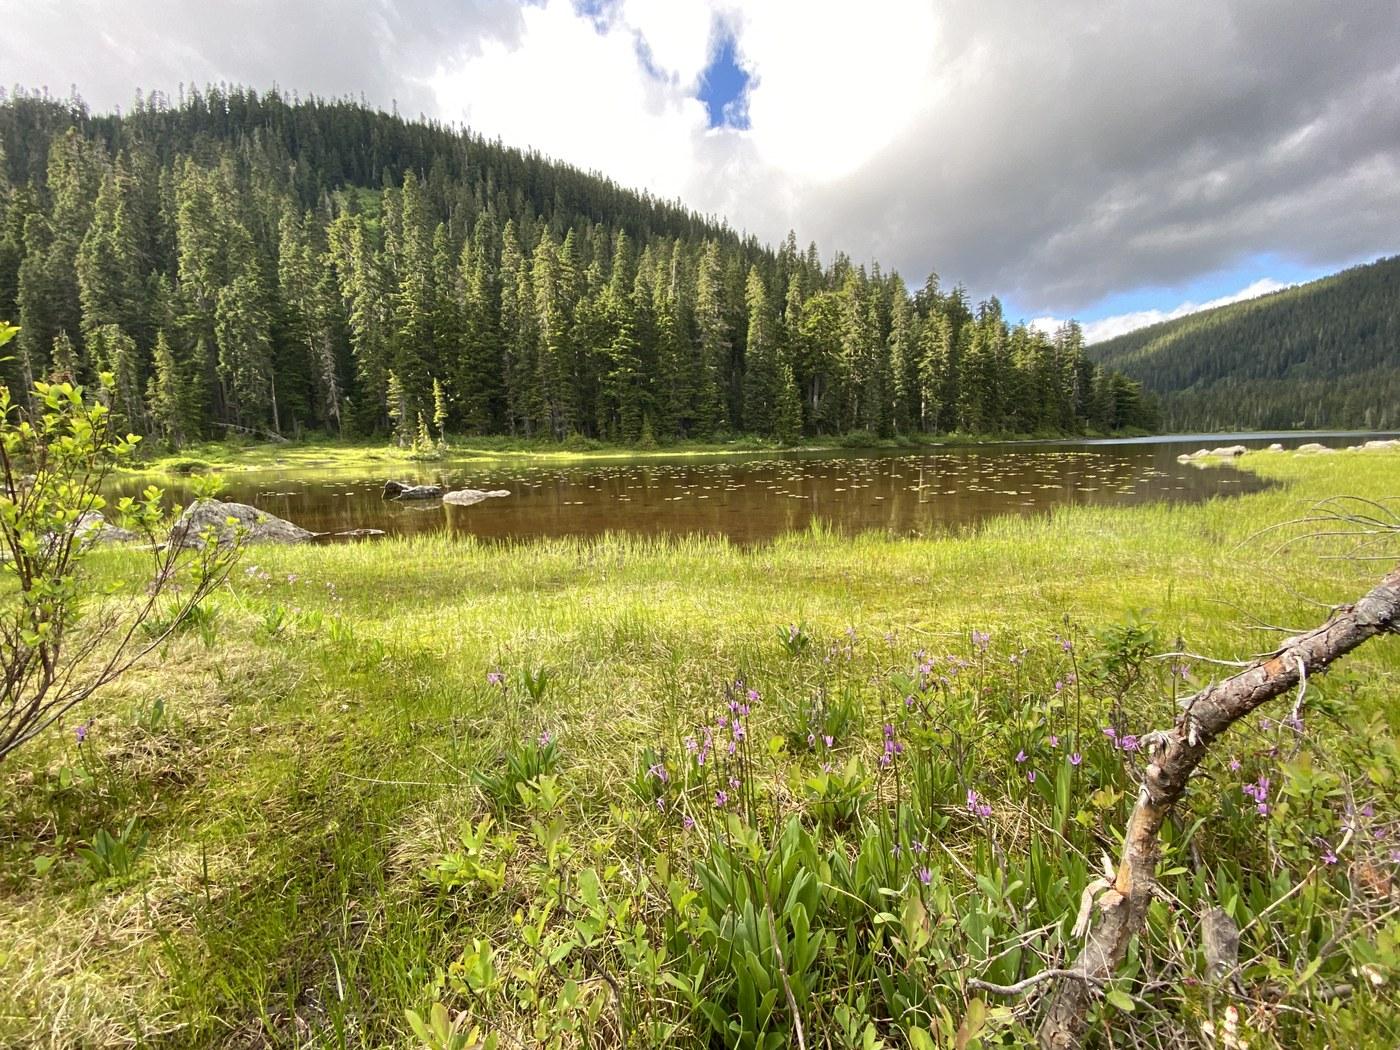 Lake Janus and Grizzly Peak. Photo by cristina.jpeg